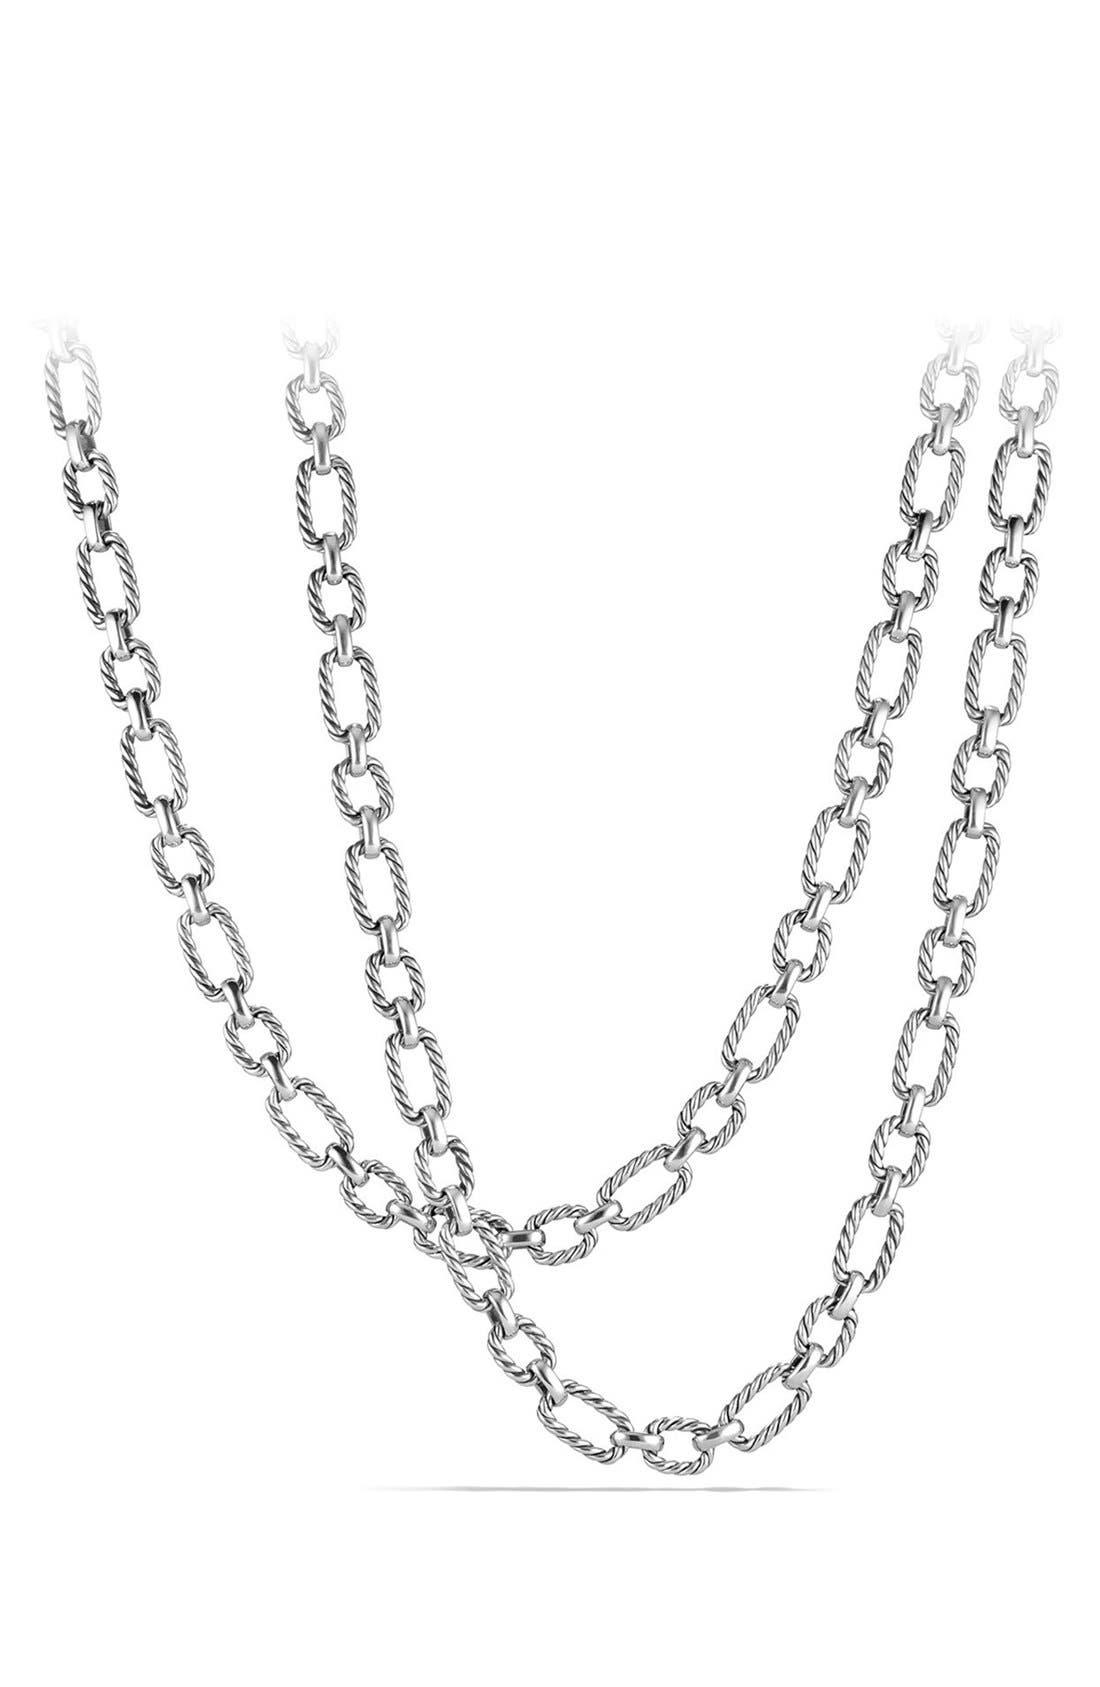 Main Image - David Yurman 'Chain' Long Cushion Link Necklace with Blue Sapphires